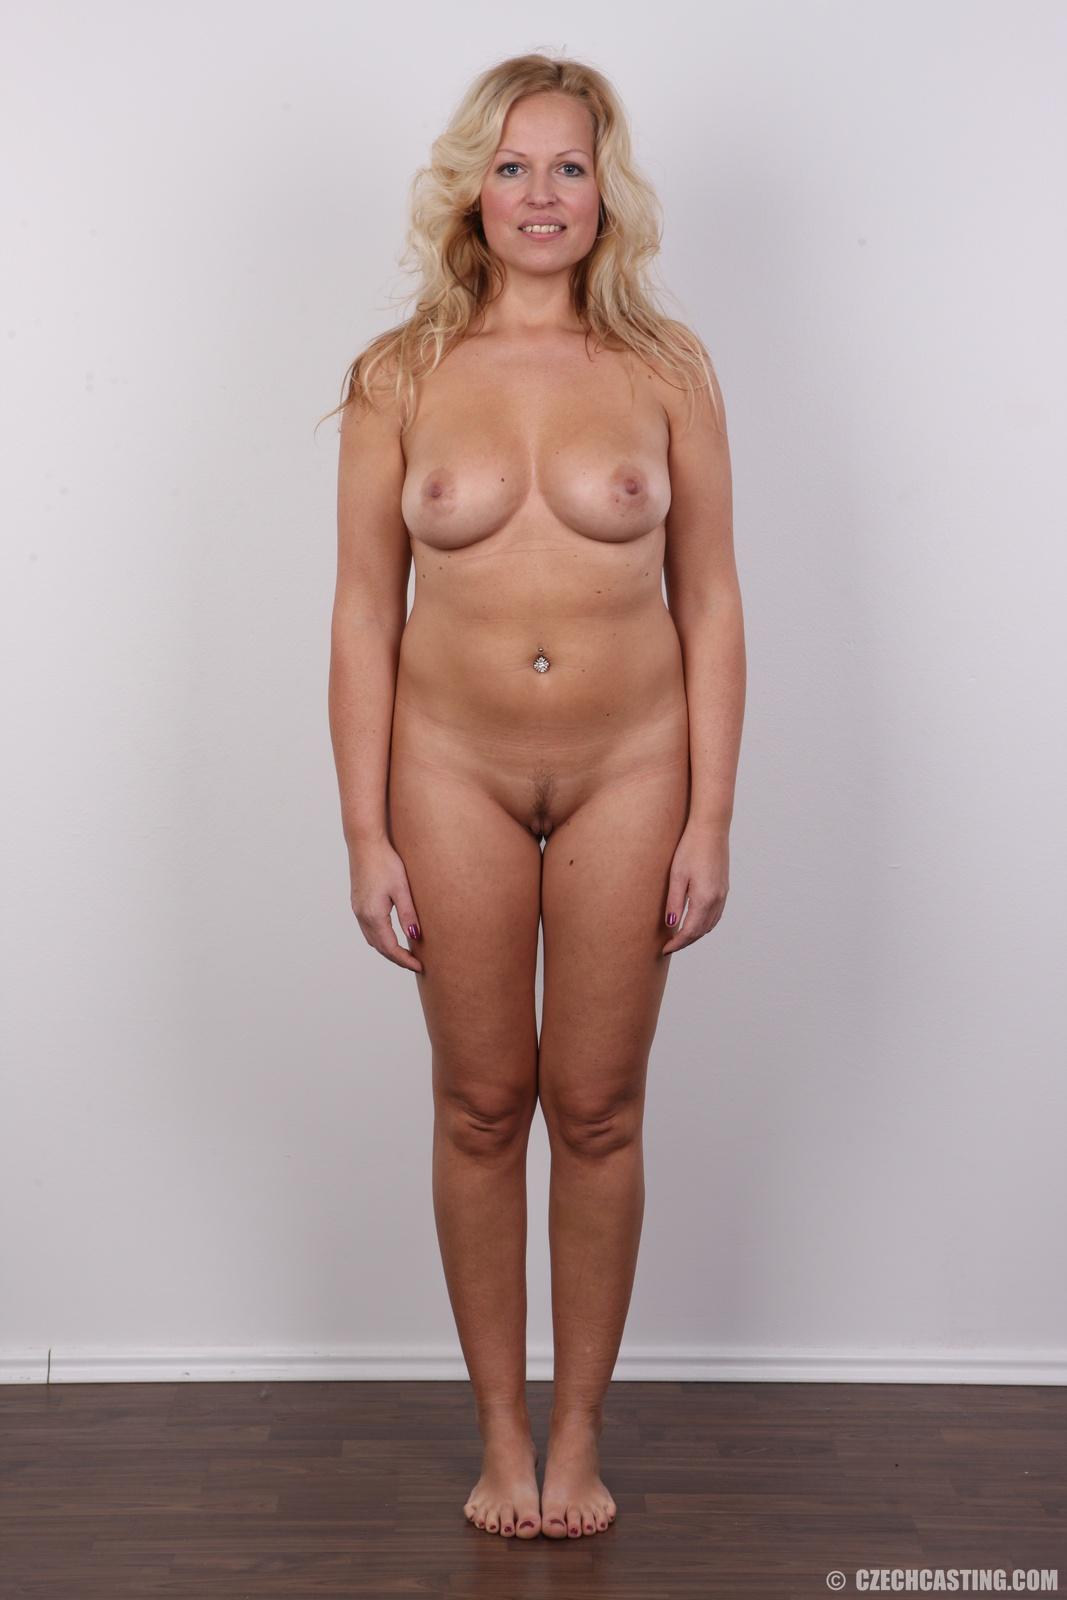 standing-mature-nude-women